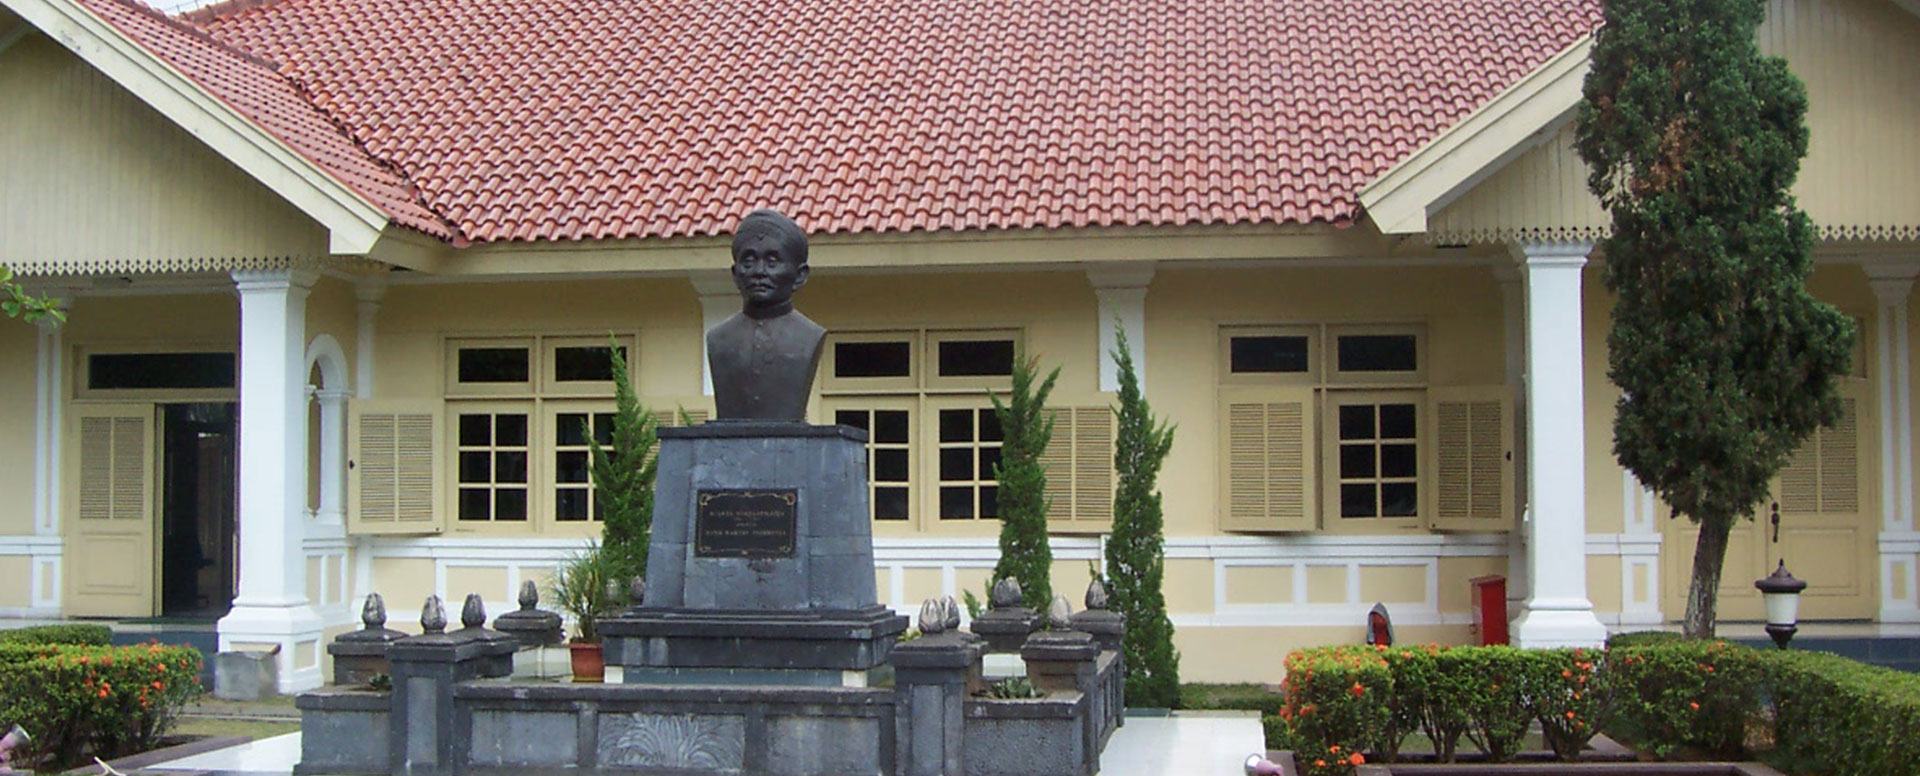 Destinasi Wisata Banyumas Museum Bank Rakyat Indonesia Panglima Besar Jendral